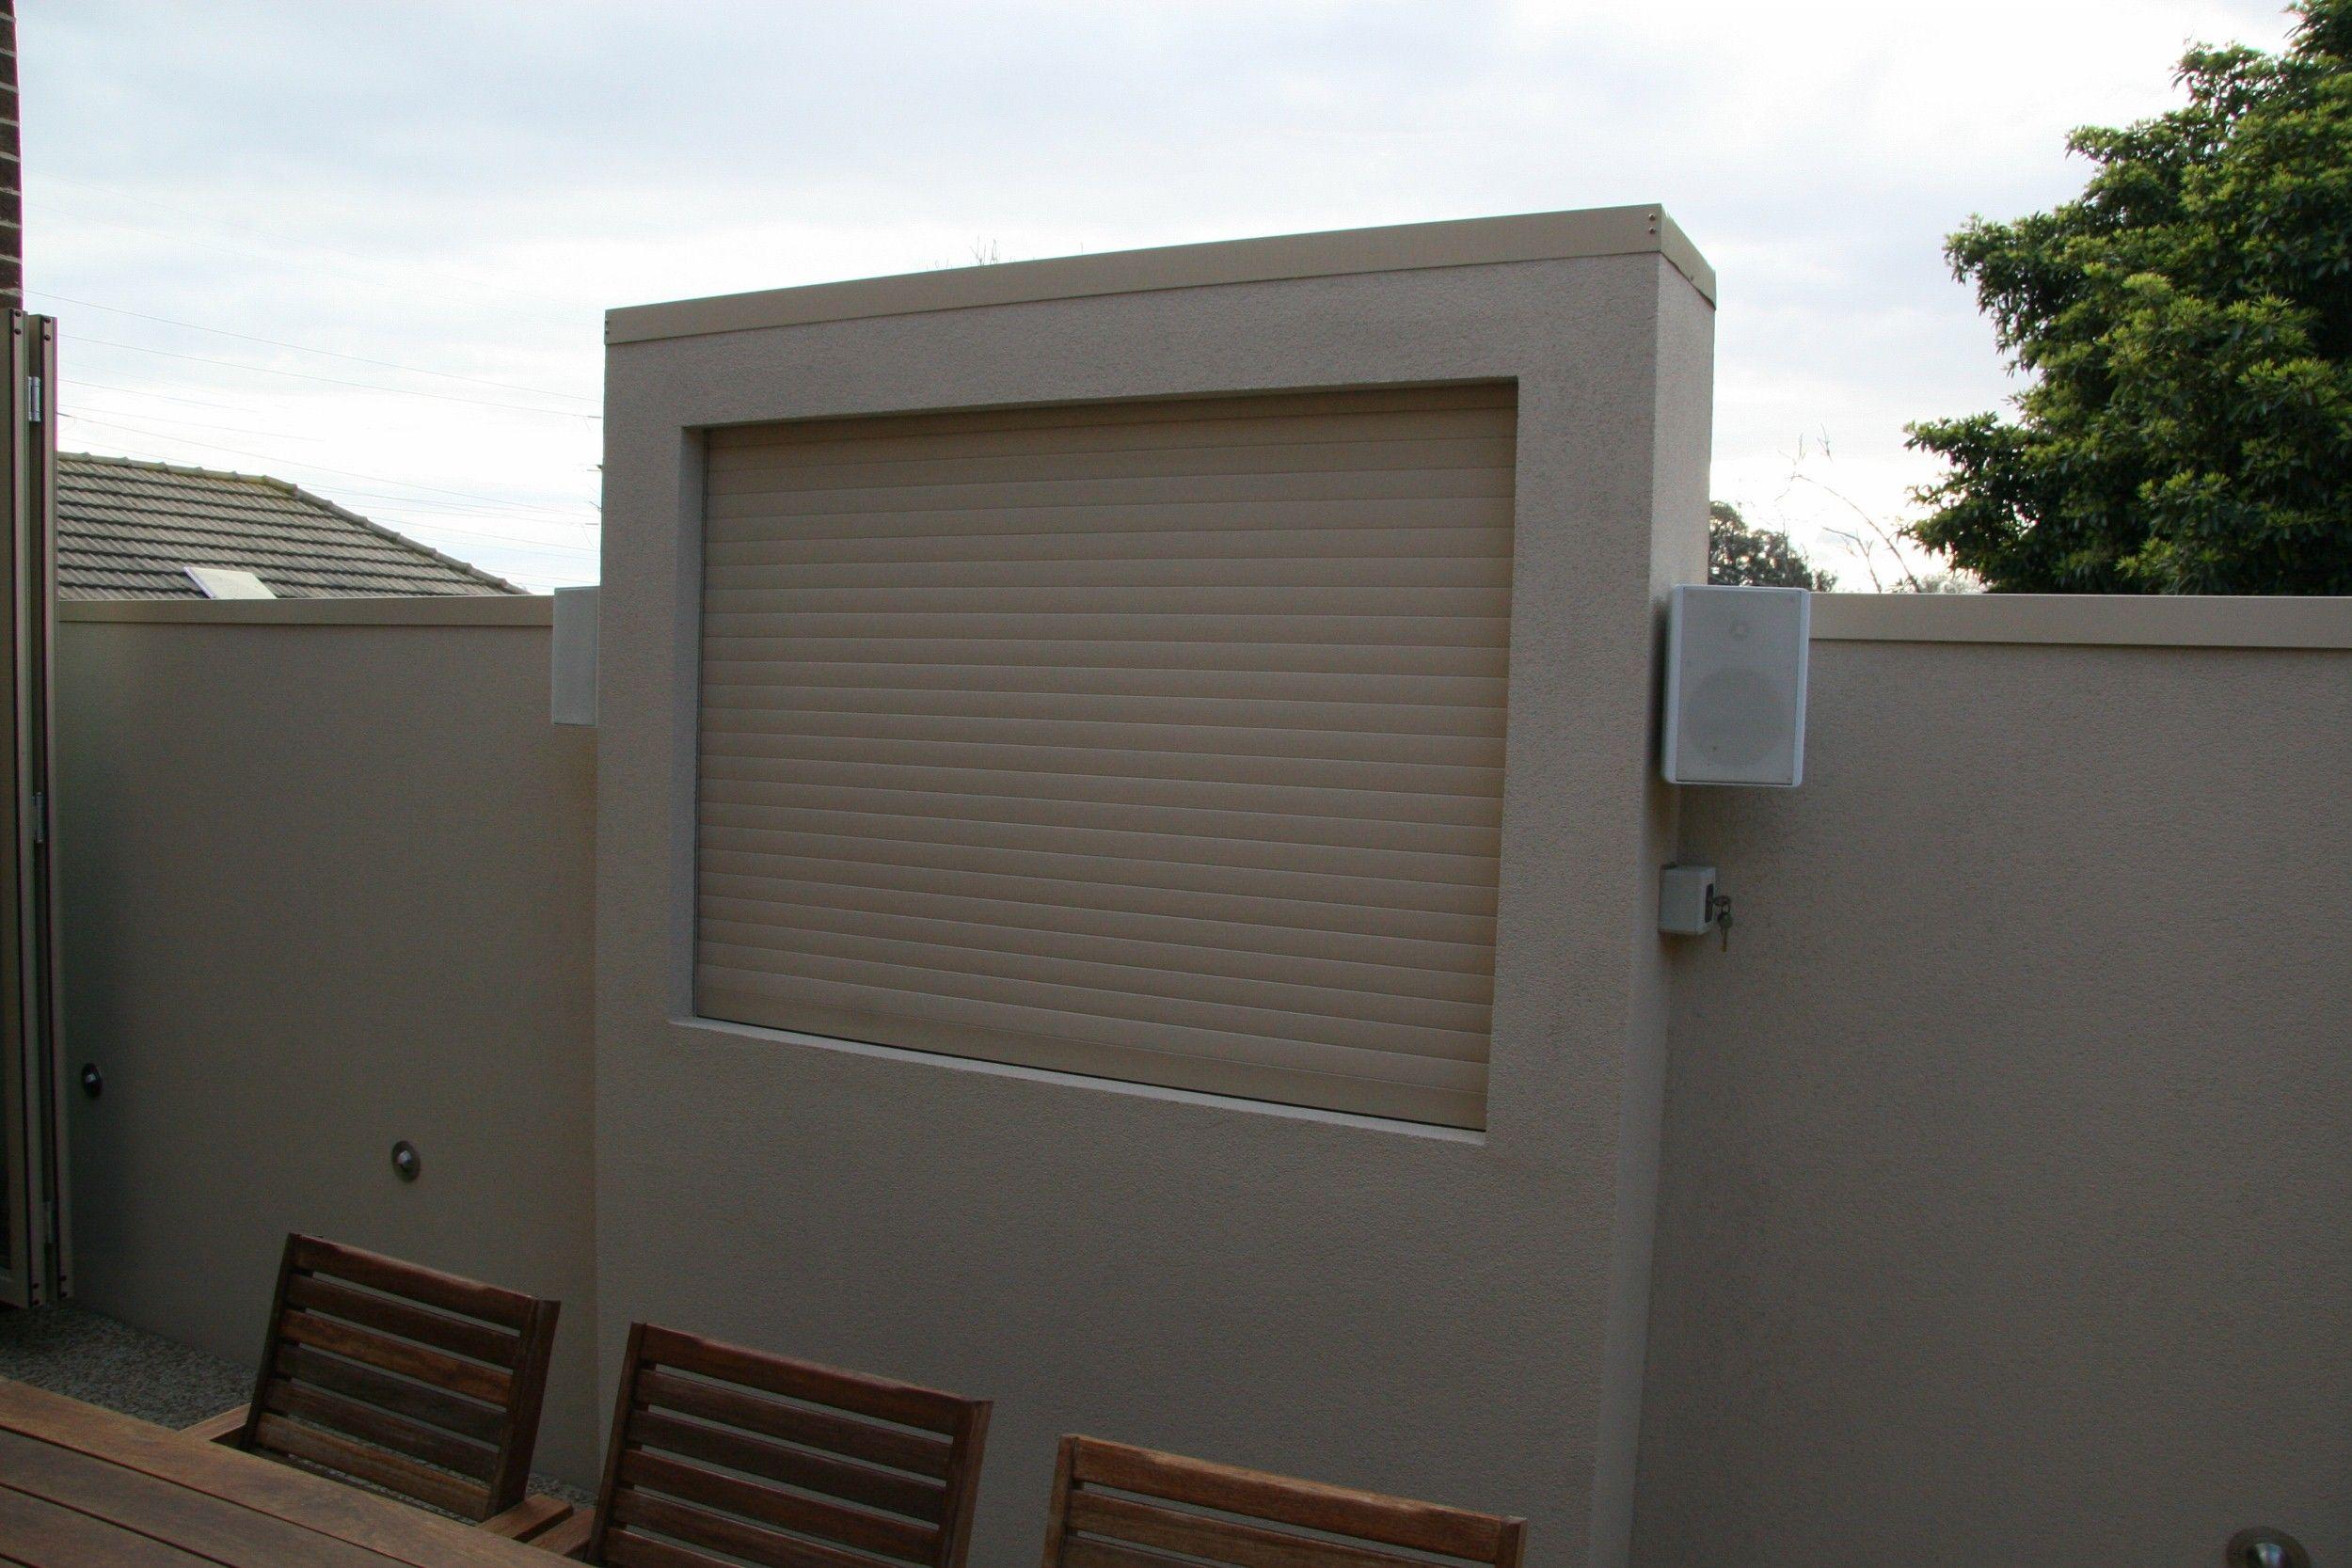 Pictures Astonishing Outdoor Tv Cabinet Waterproof | Decor ideas ...